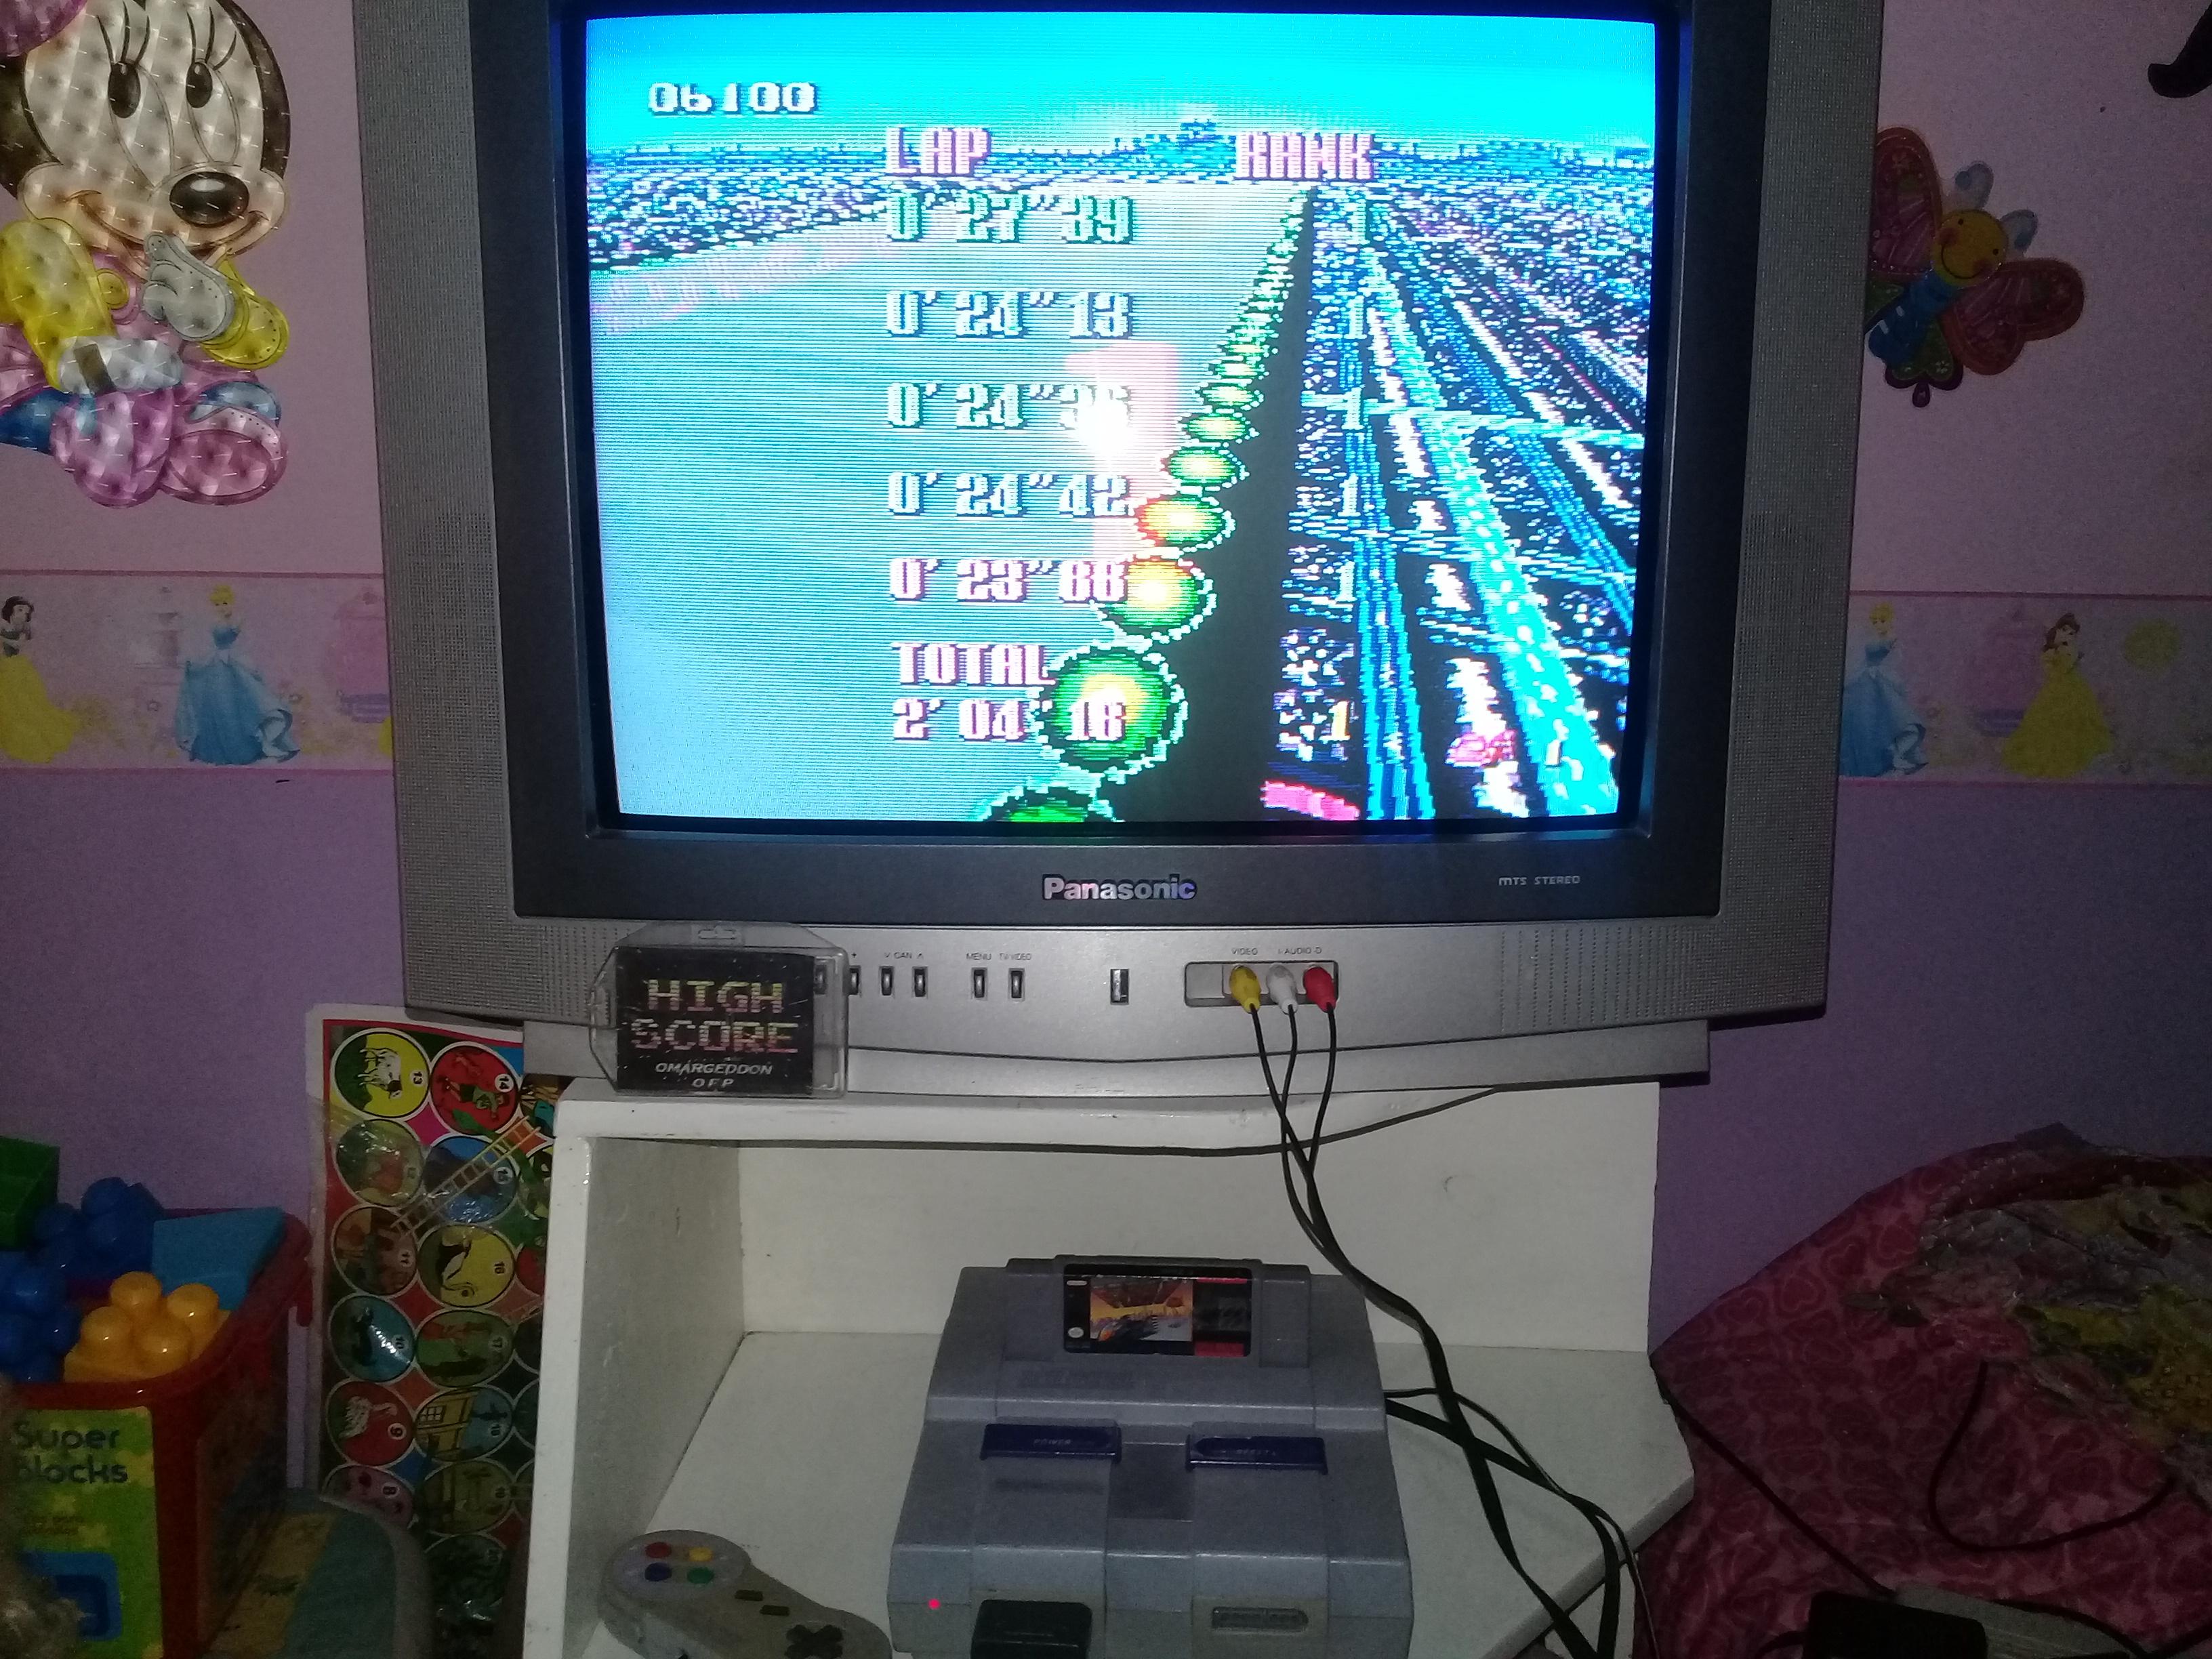 omargeddon: F-Zero: Mute City I [Beginner] (SNES/Super Famicom) 0:02:04.18 points on 2019-06-14 14:49:37